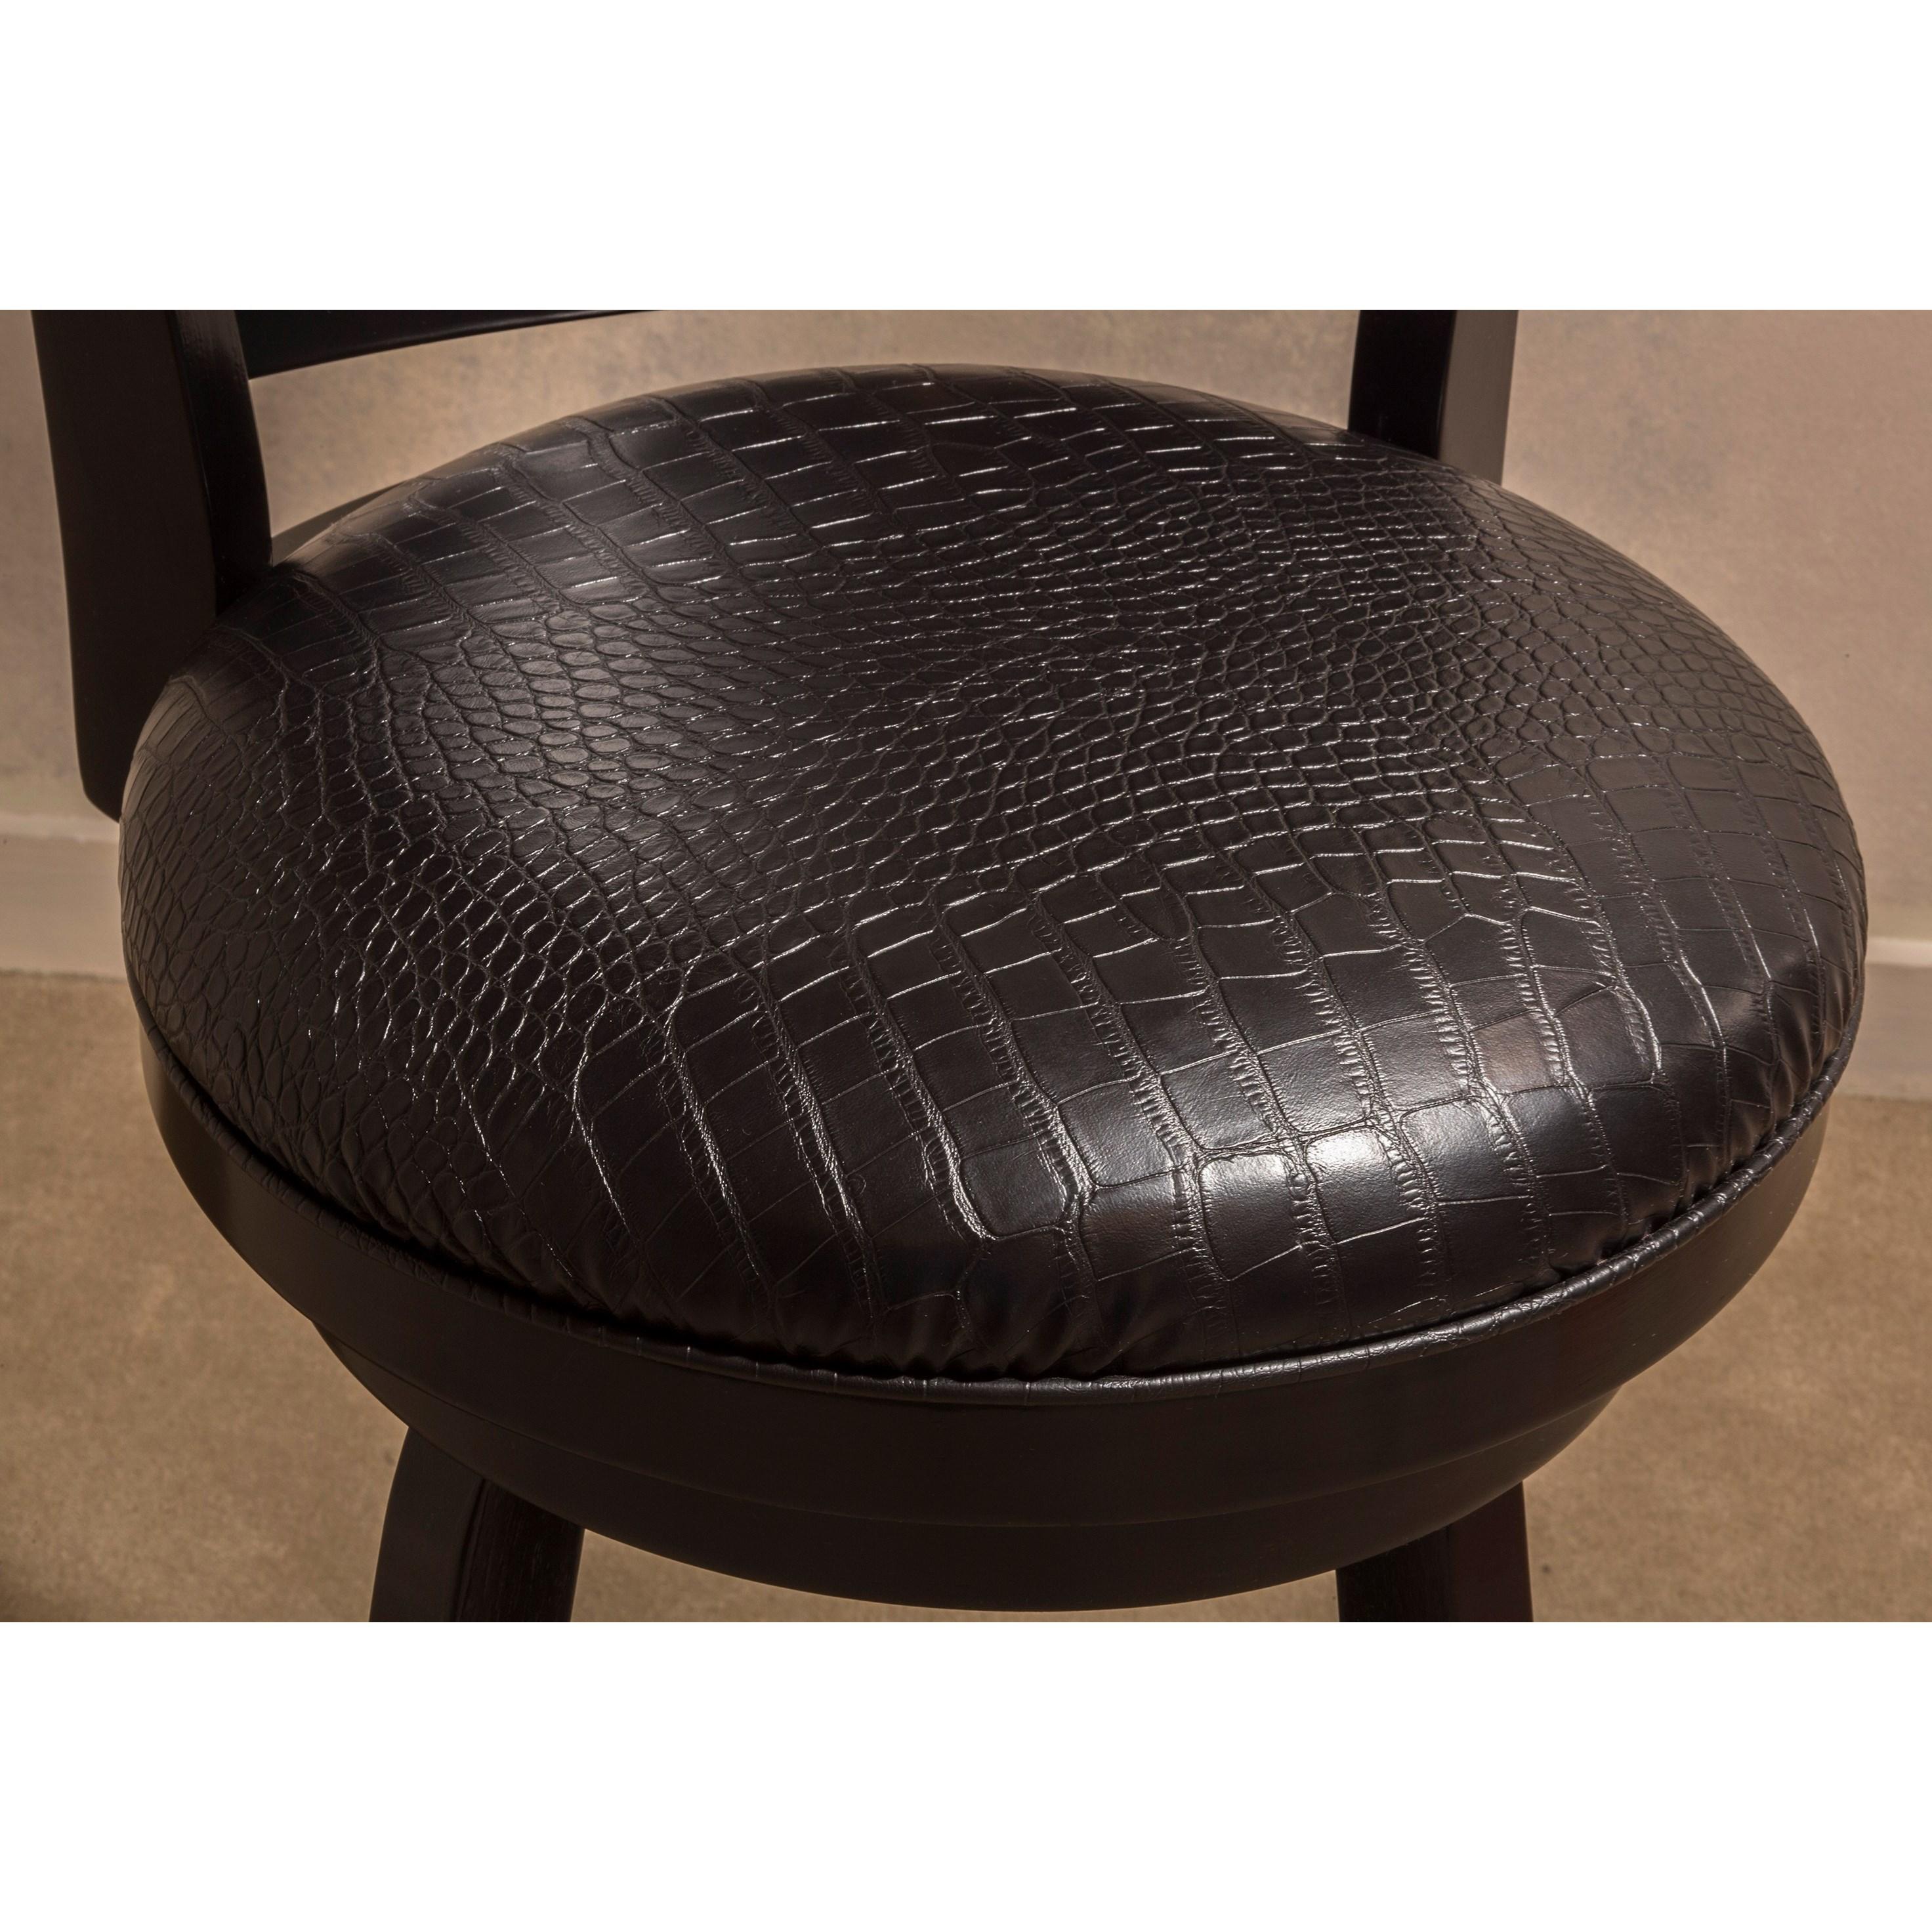 Hillsdale Wood Stools Fauz Leather Croc Skin Design Swivel